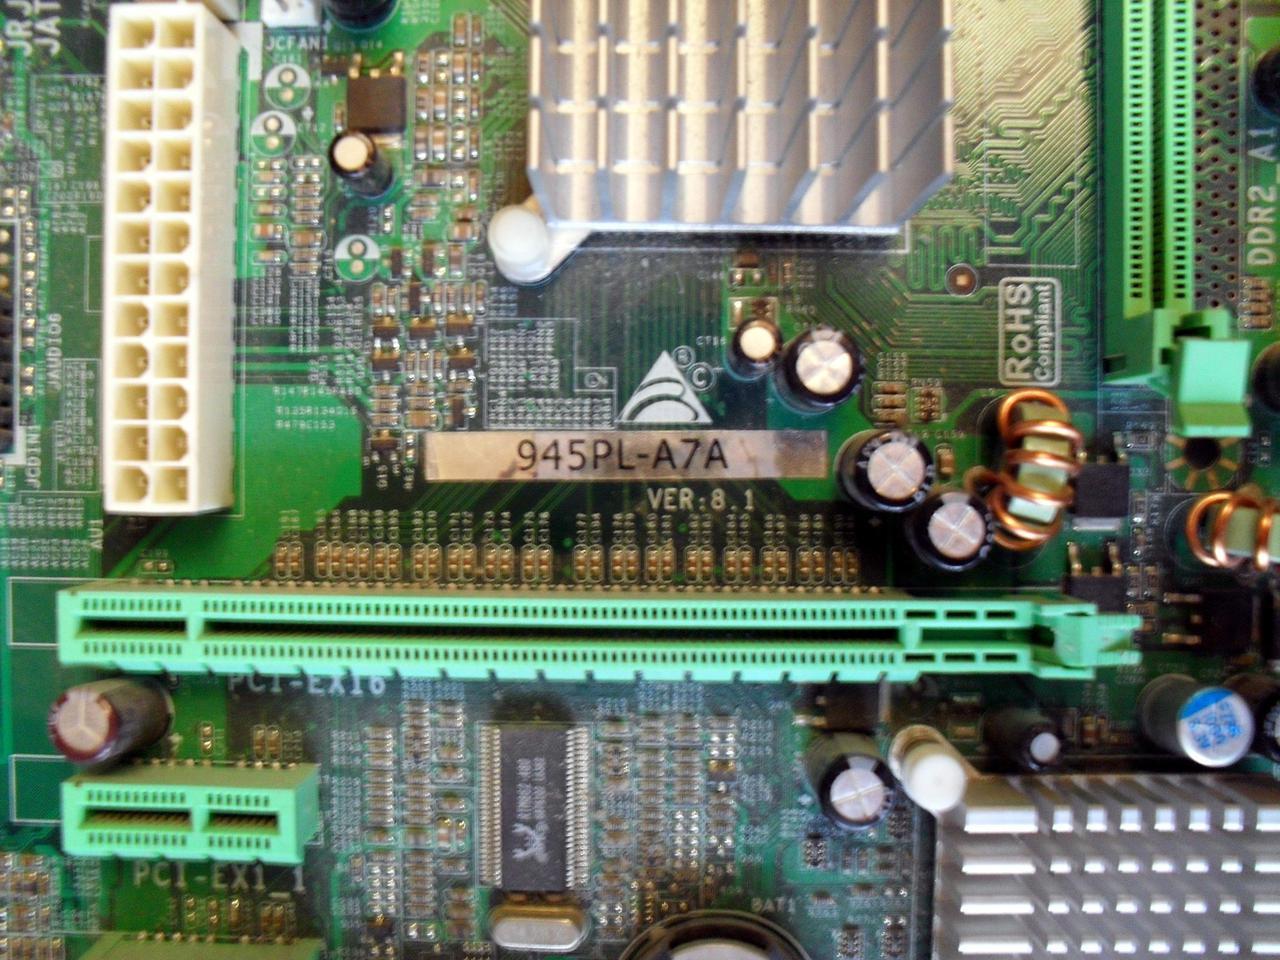 Biostar 945PL-A7A Windows Vista 64-BIT